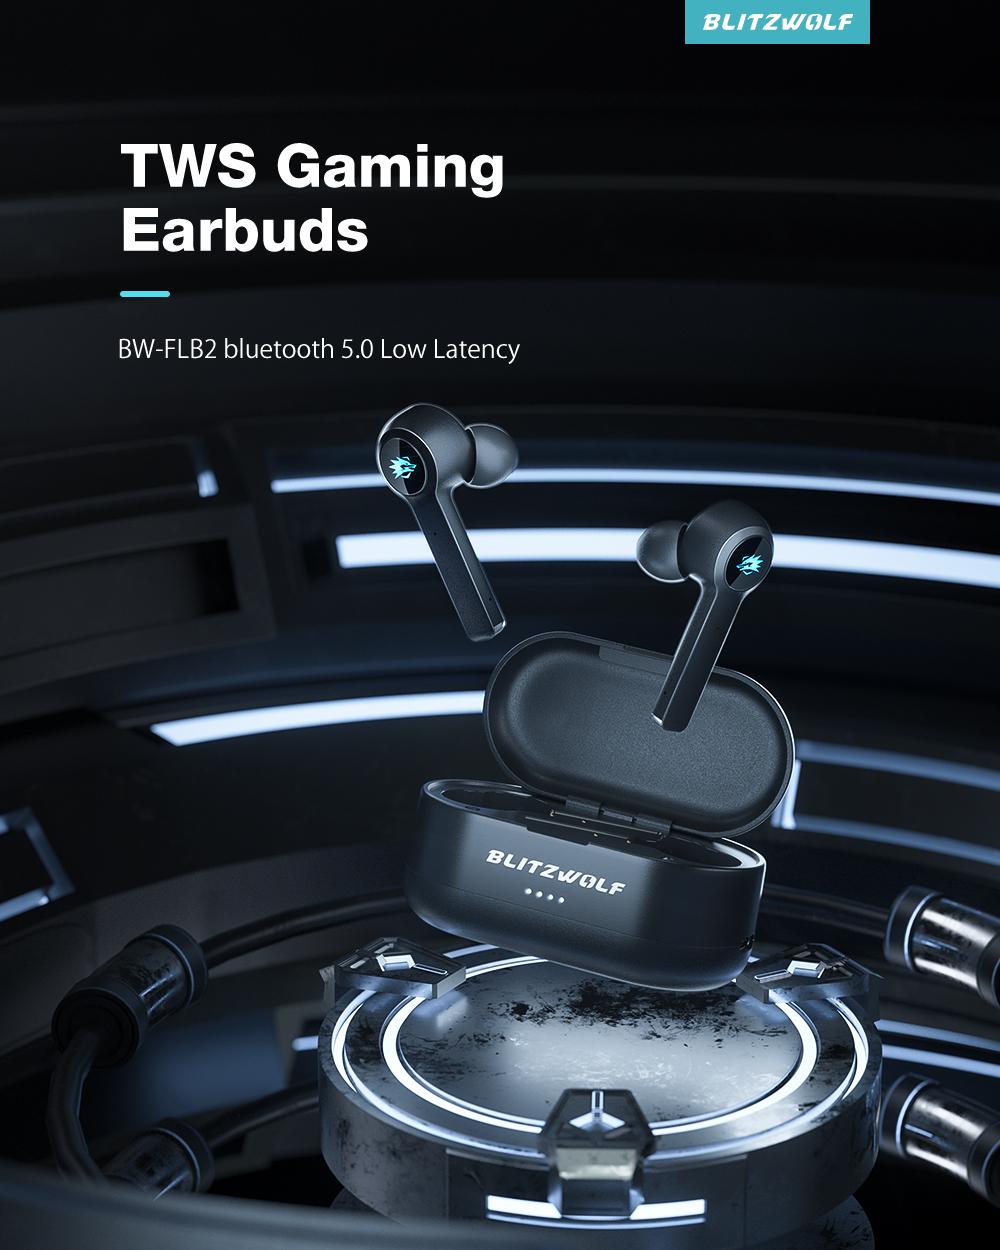 Blitzwolf BW-FLB2 TWS headset